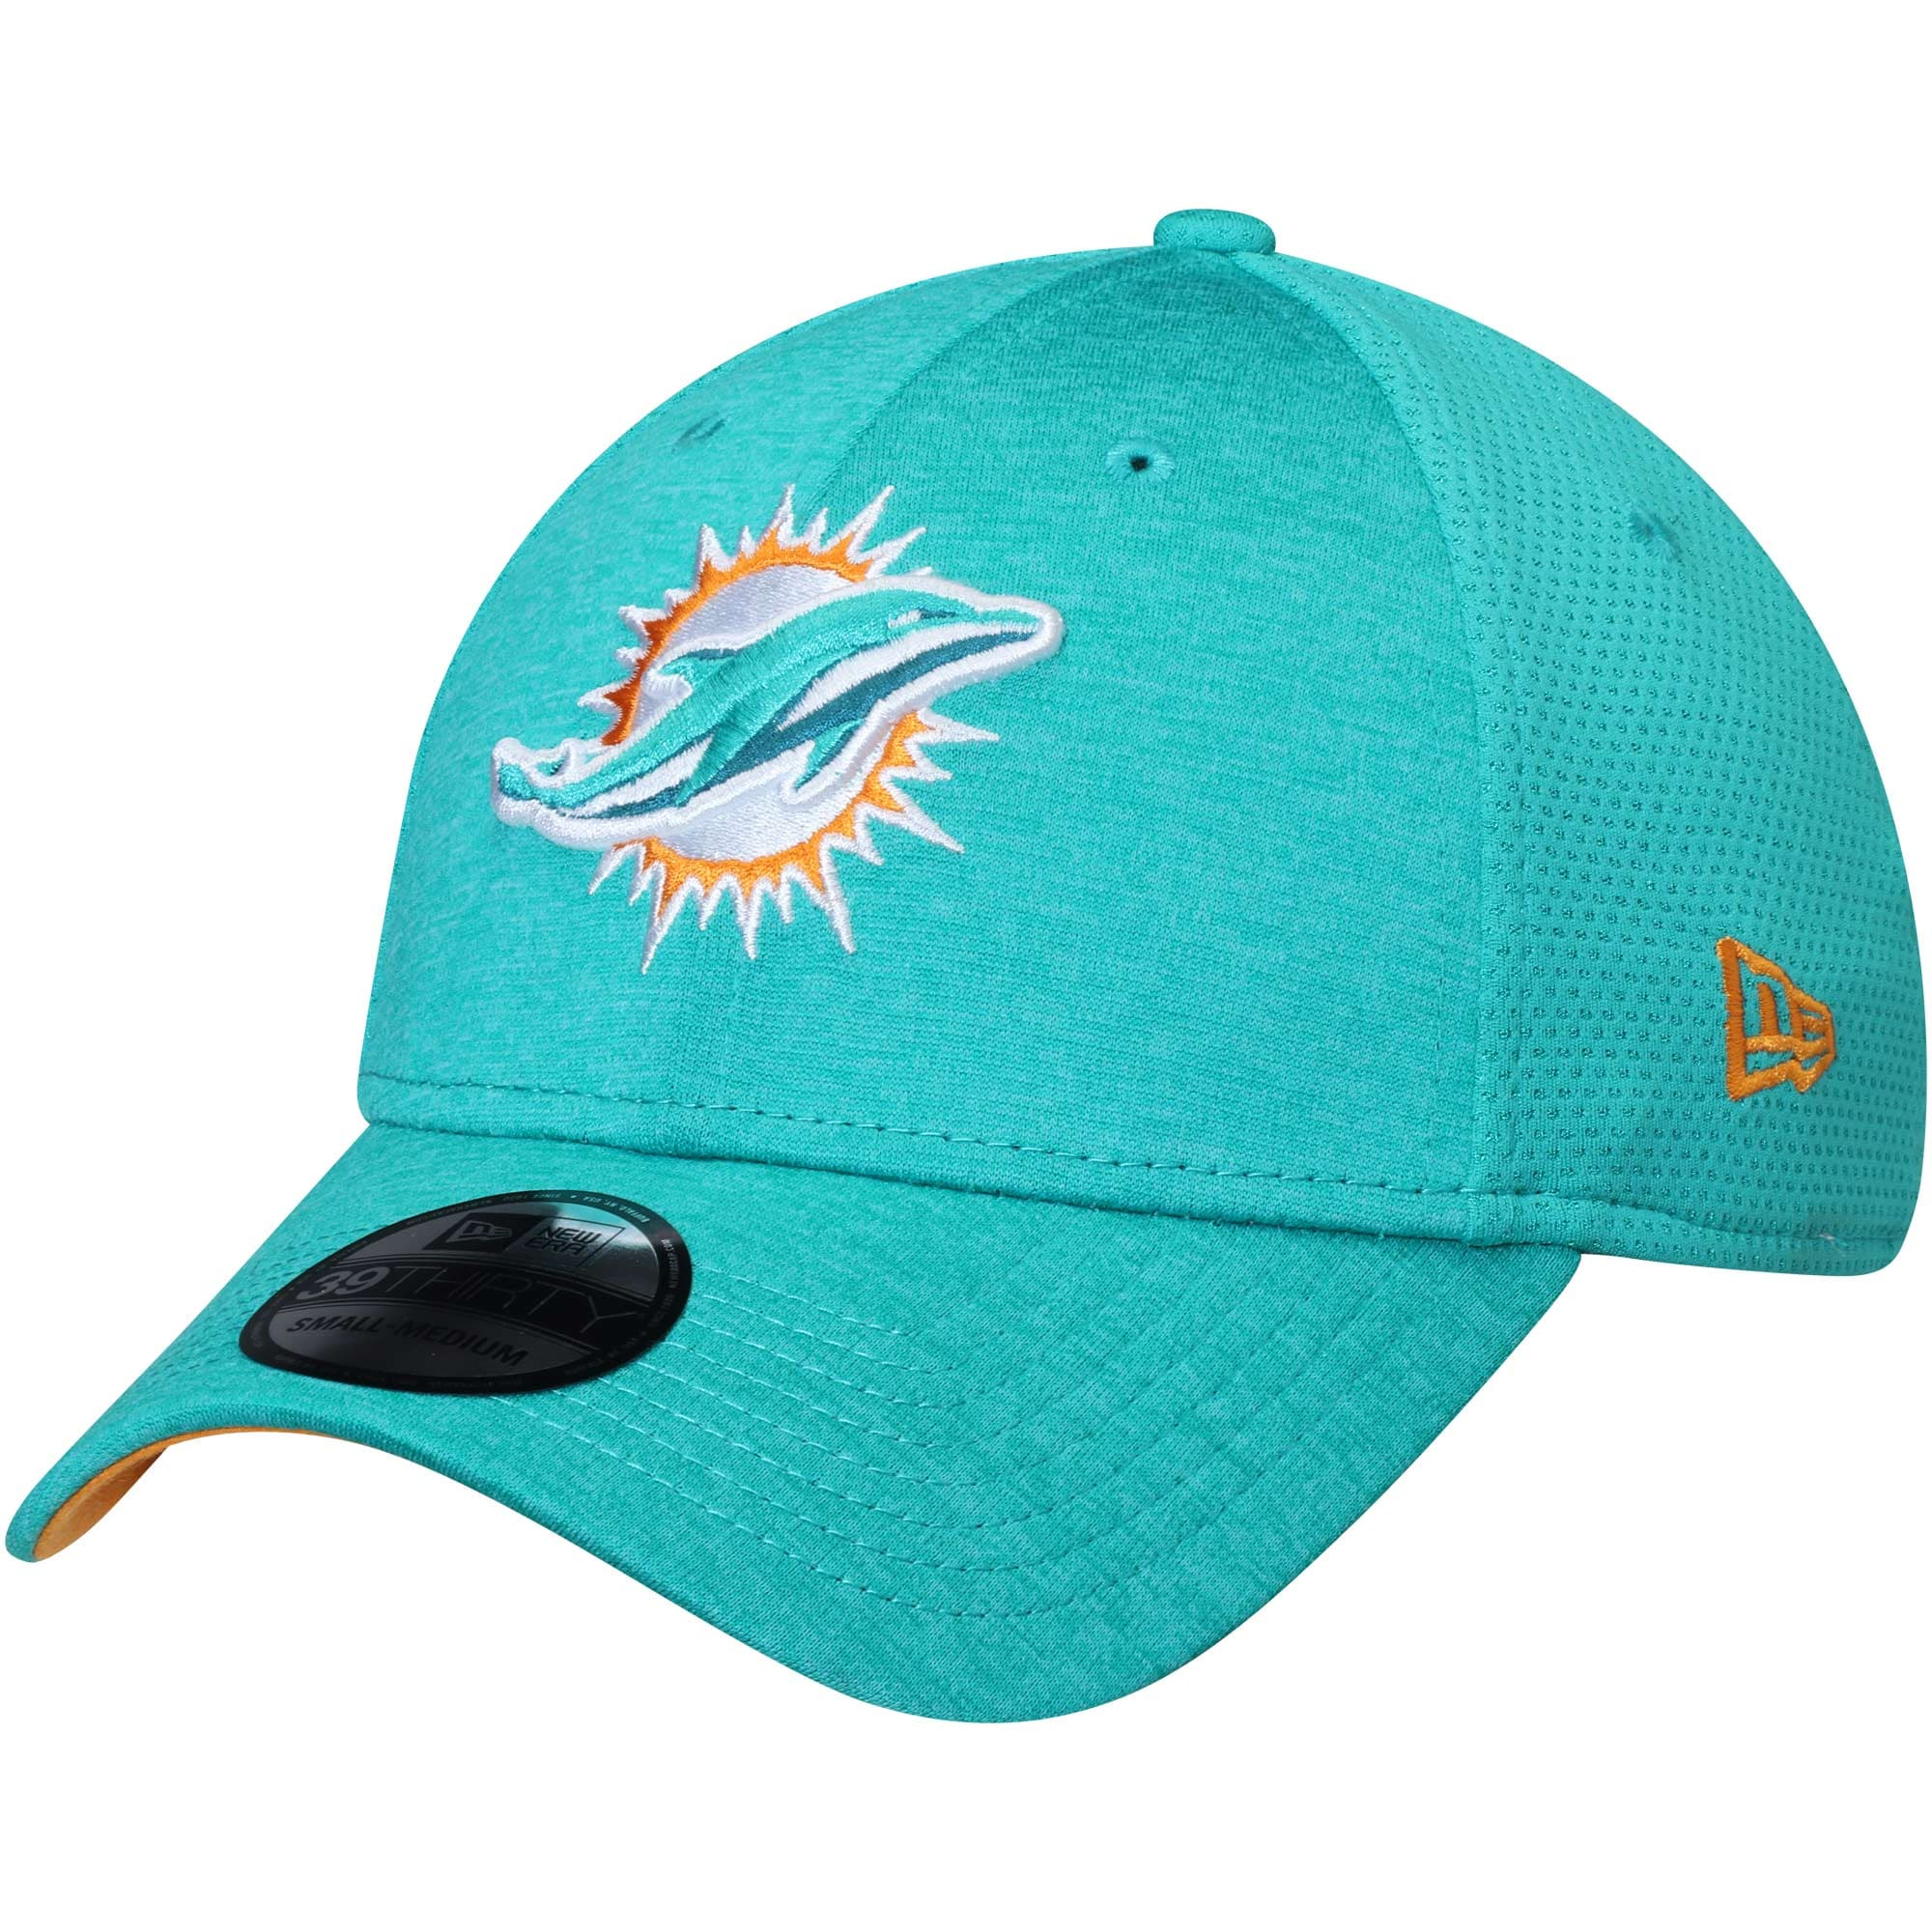 Miami Dolphins New Era Shadowed Team 39THIRTY Flex Hat - Aqua